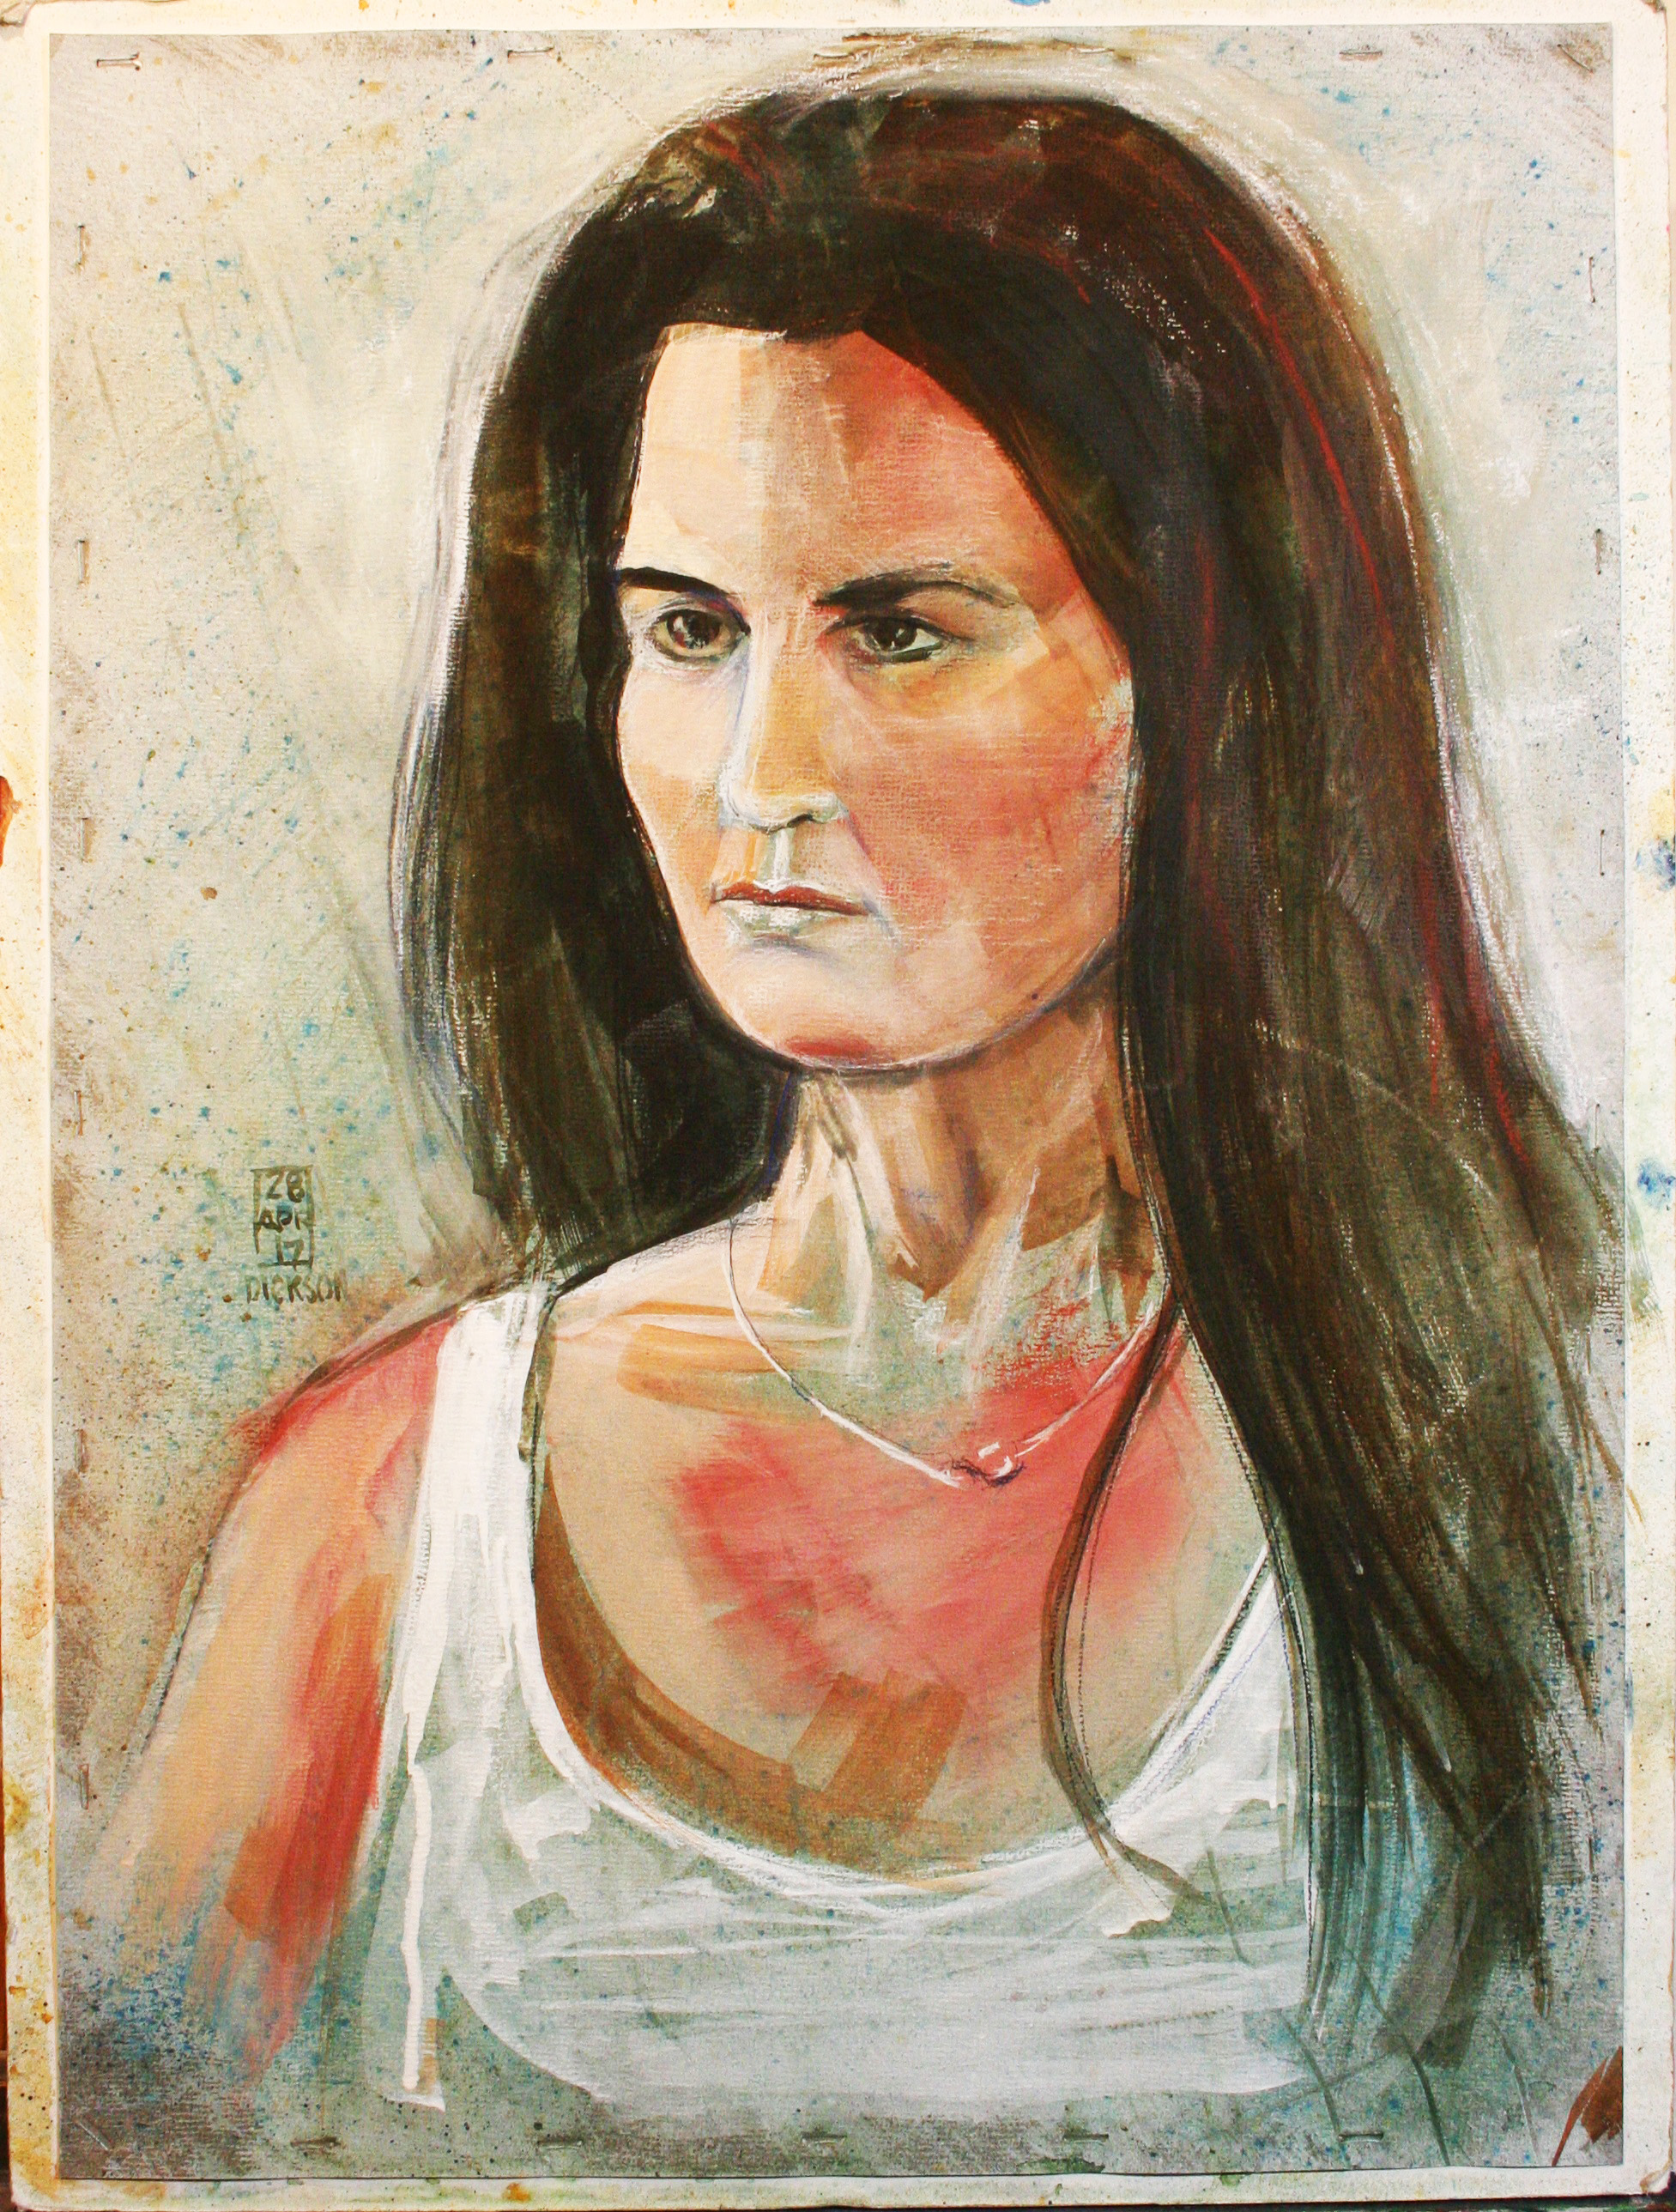 Duane Dickson did this 3-hour portrait.